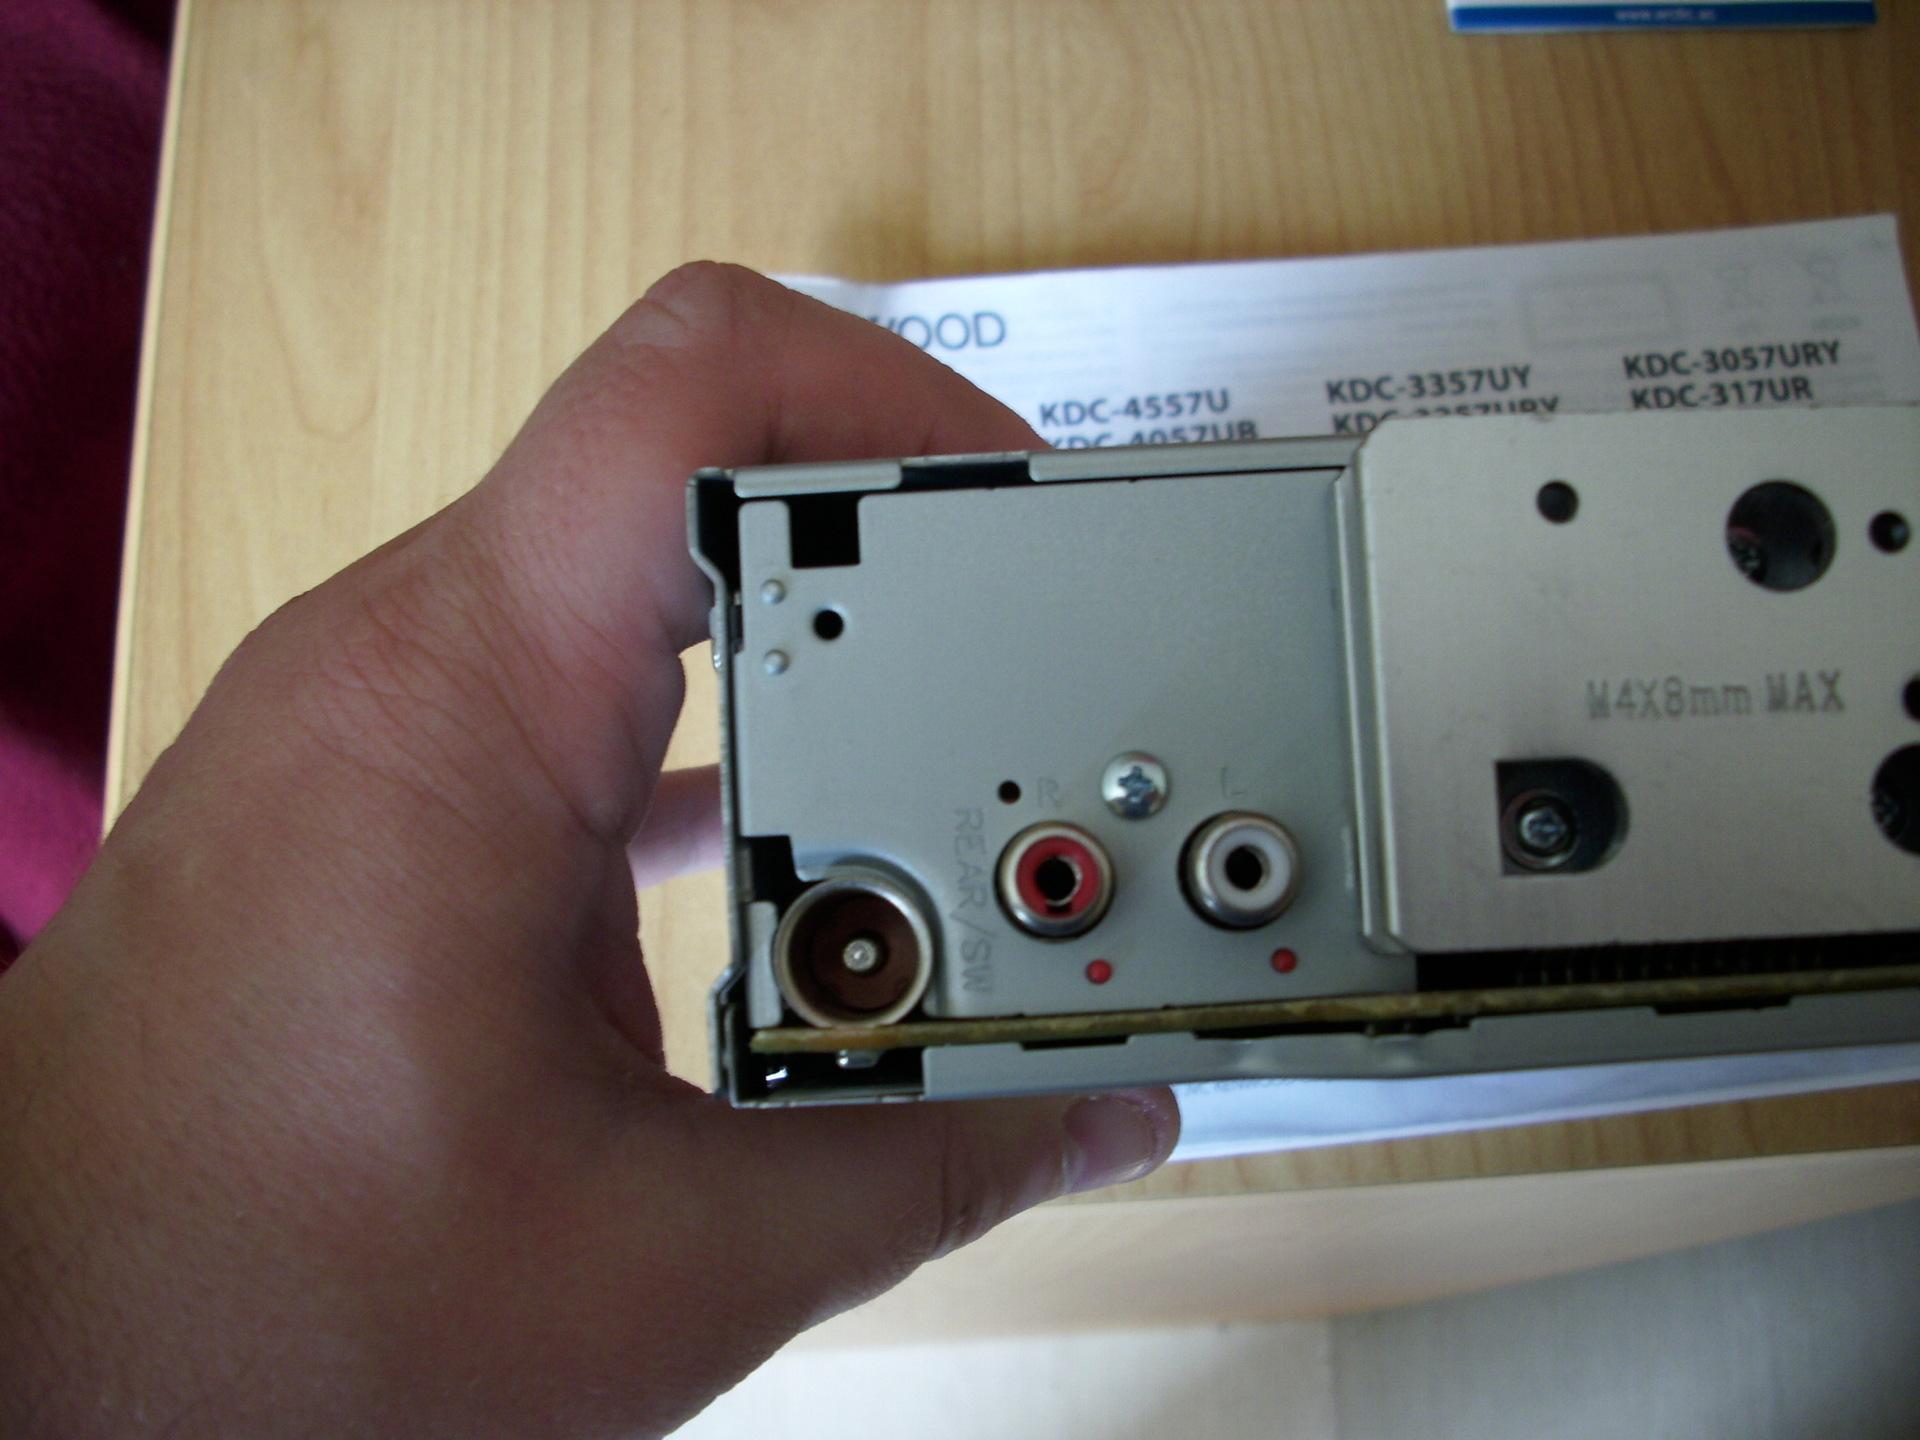 Antennenanschluss vom Autoradio | 1997, 8l, a3, adapter, anschluss ...